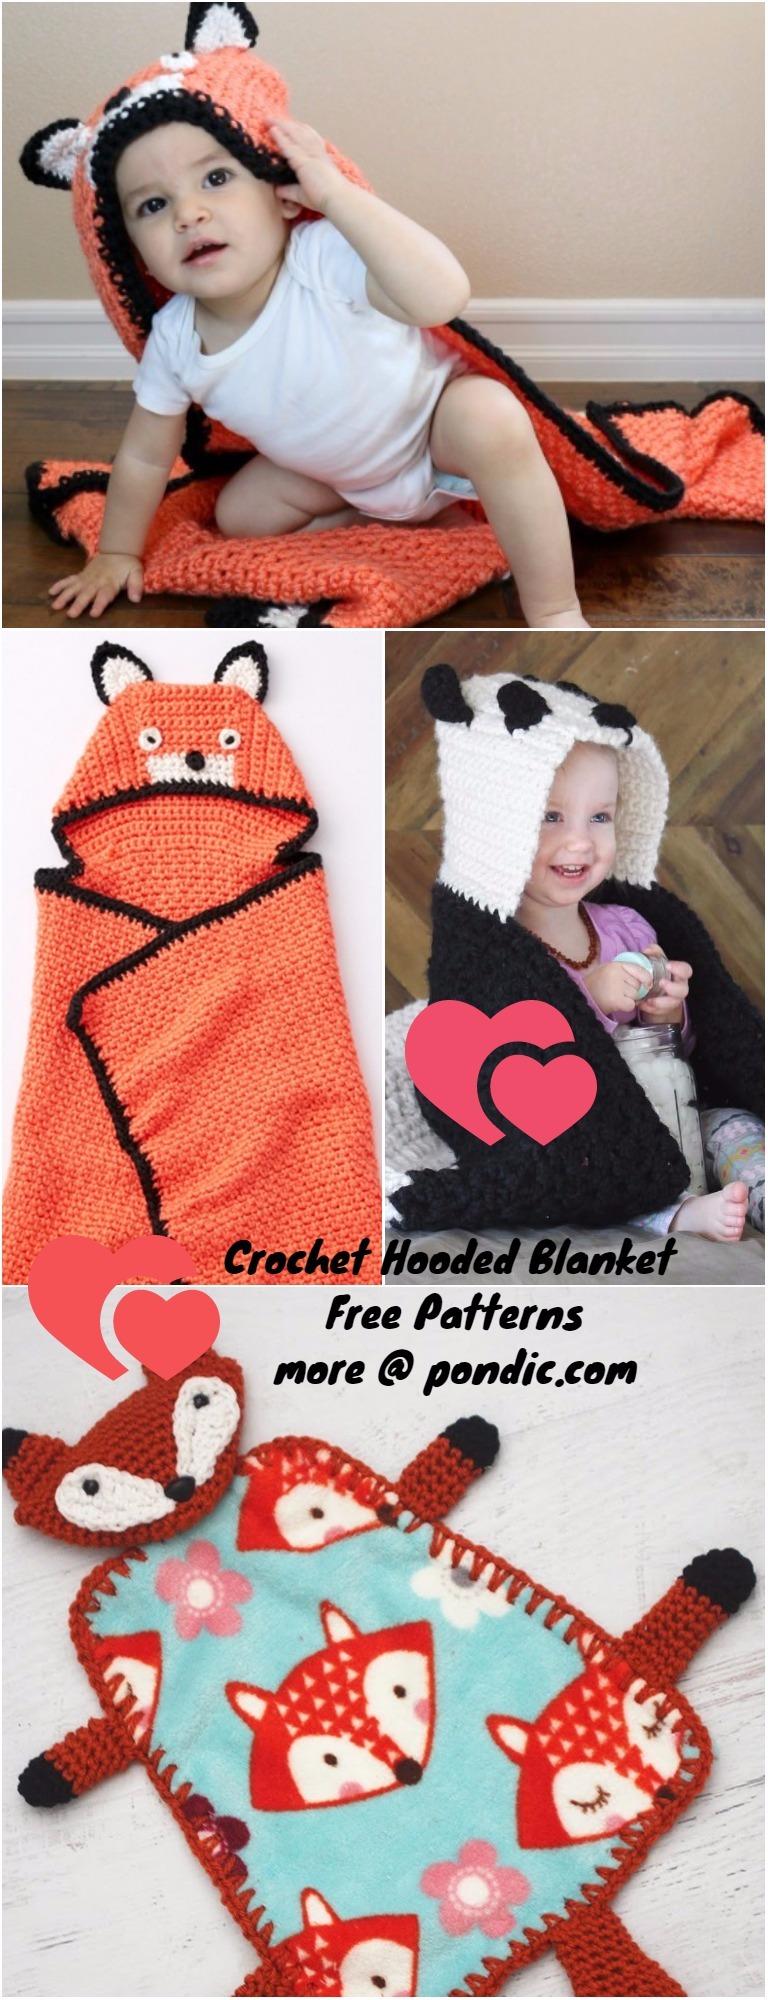 Crochet Hooded Blanket Free Patterns Pondic